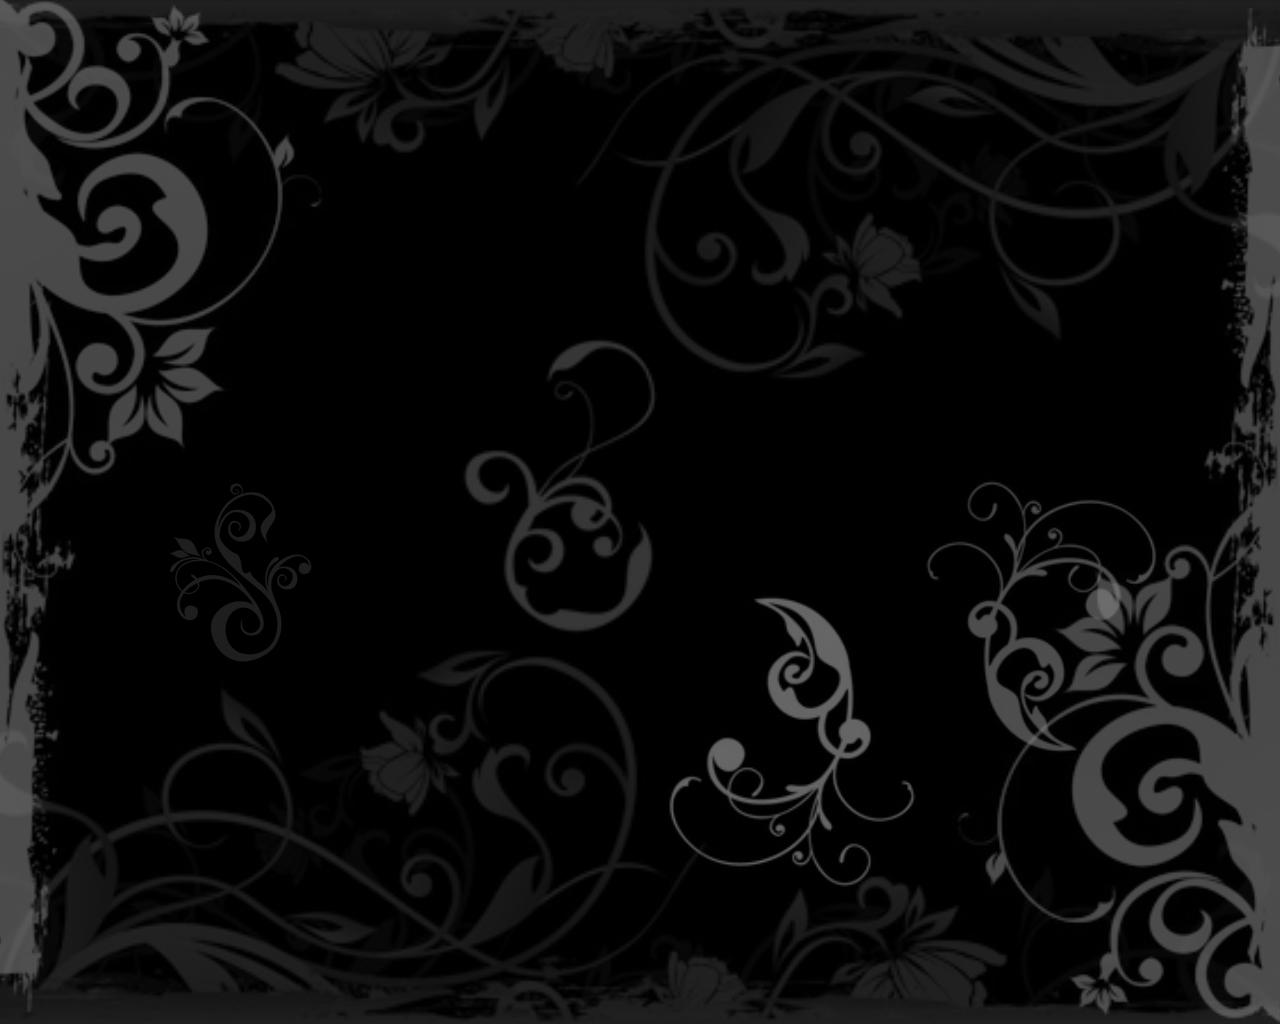 Black Hd Black Wallpaper Hd 9 Cool Hd Wallpaper